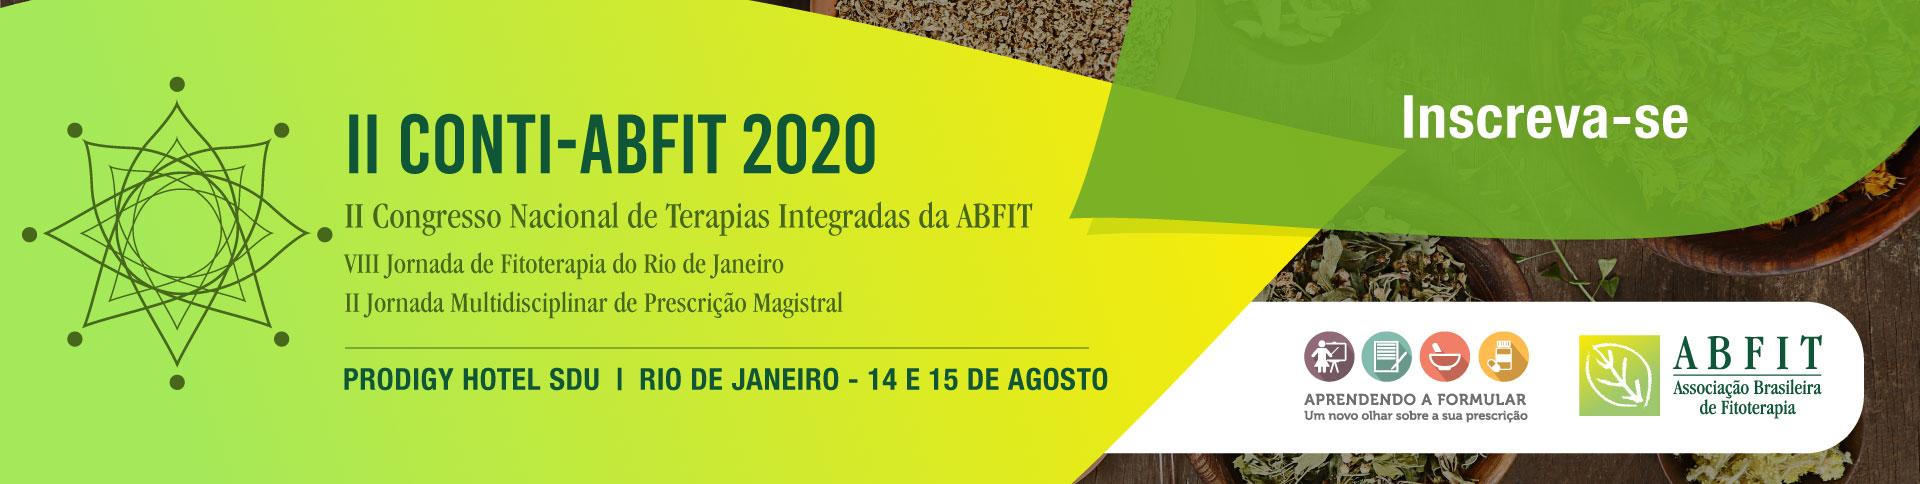 banner-1920x484-conti-abfit-2020-inscreva-se-191008.jpg